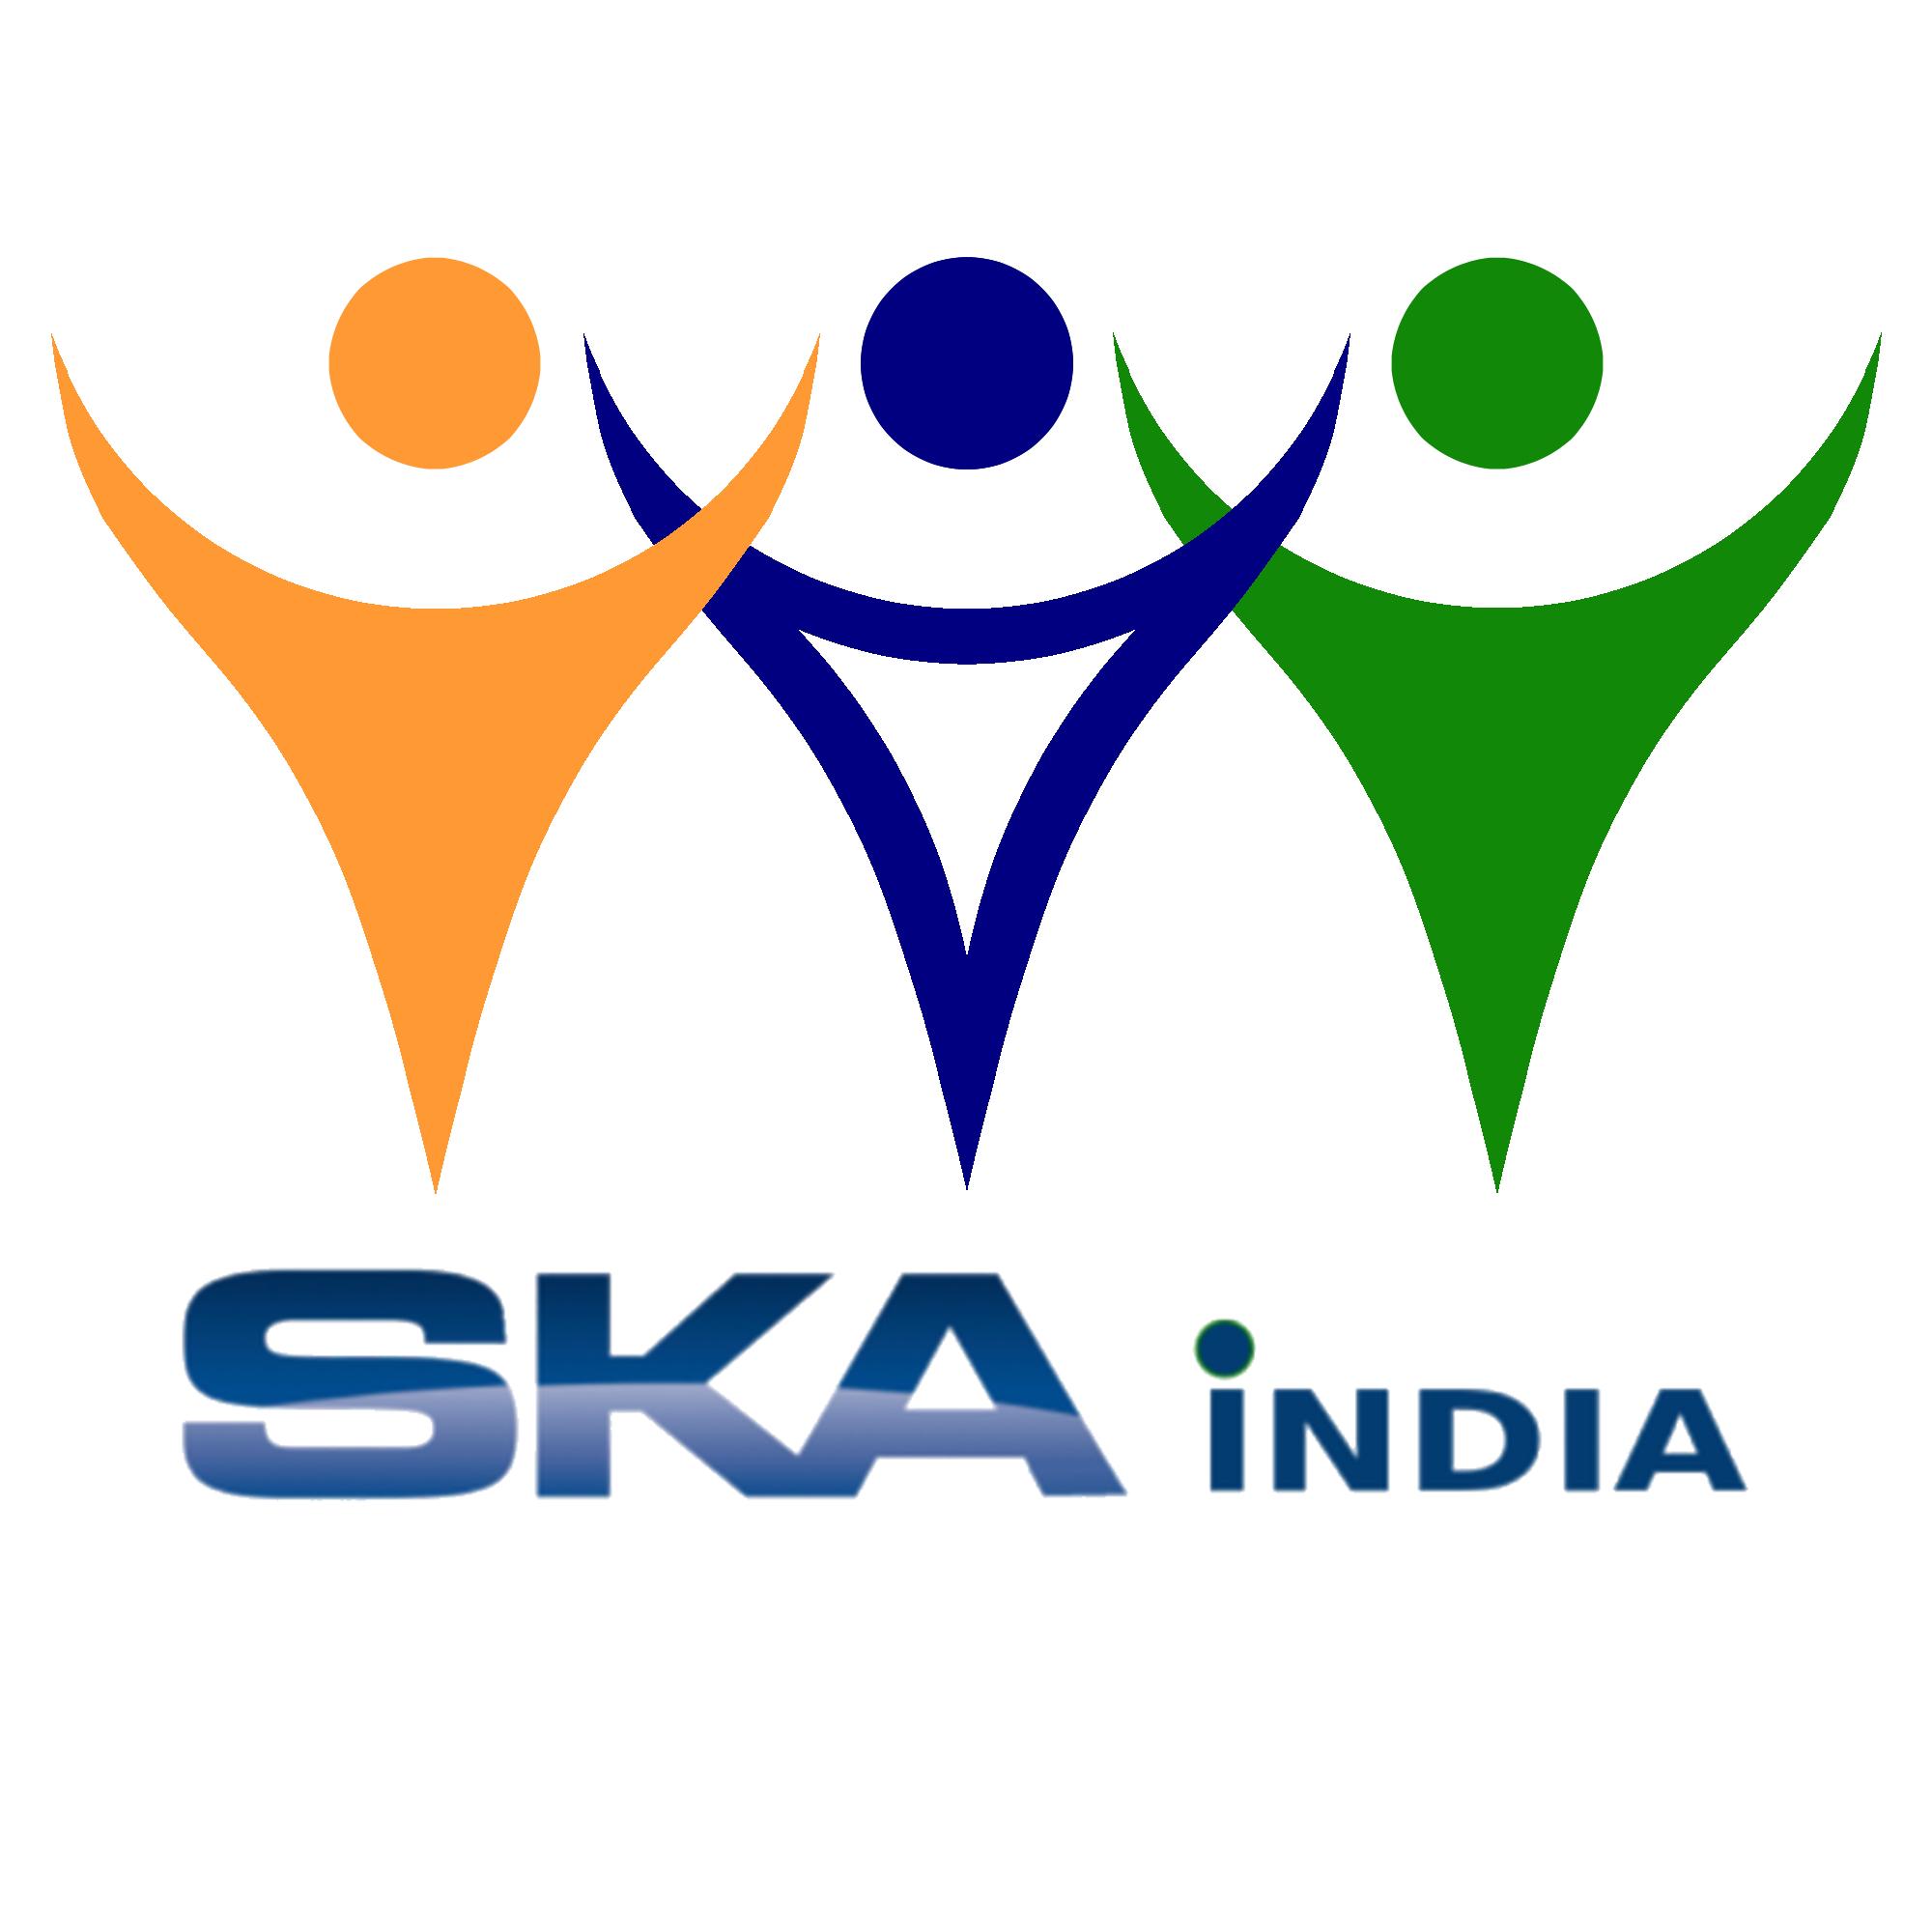 SKA India